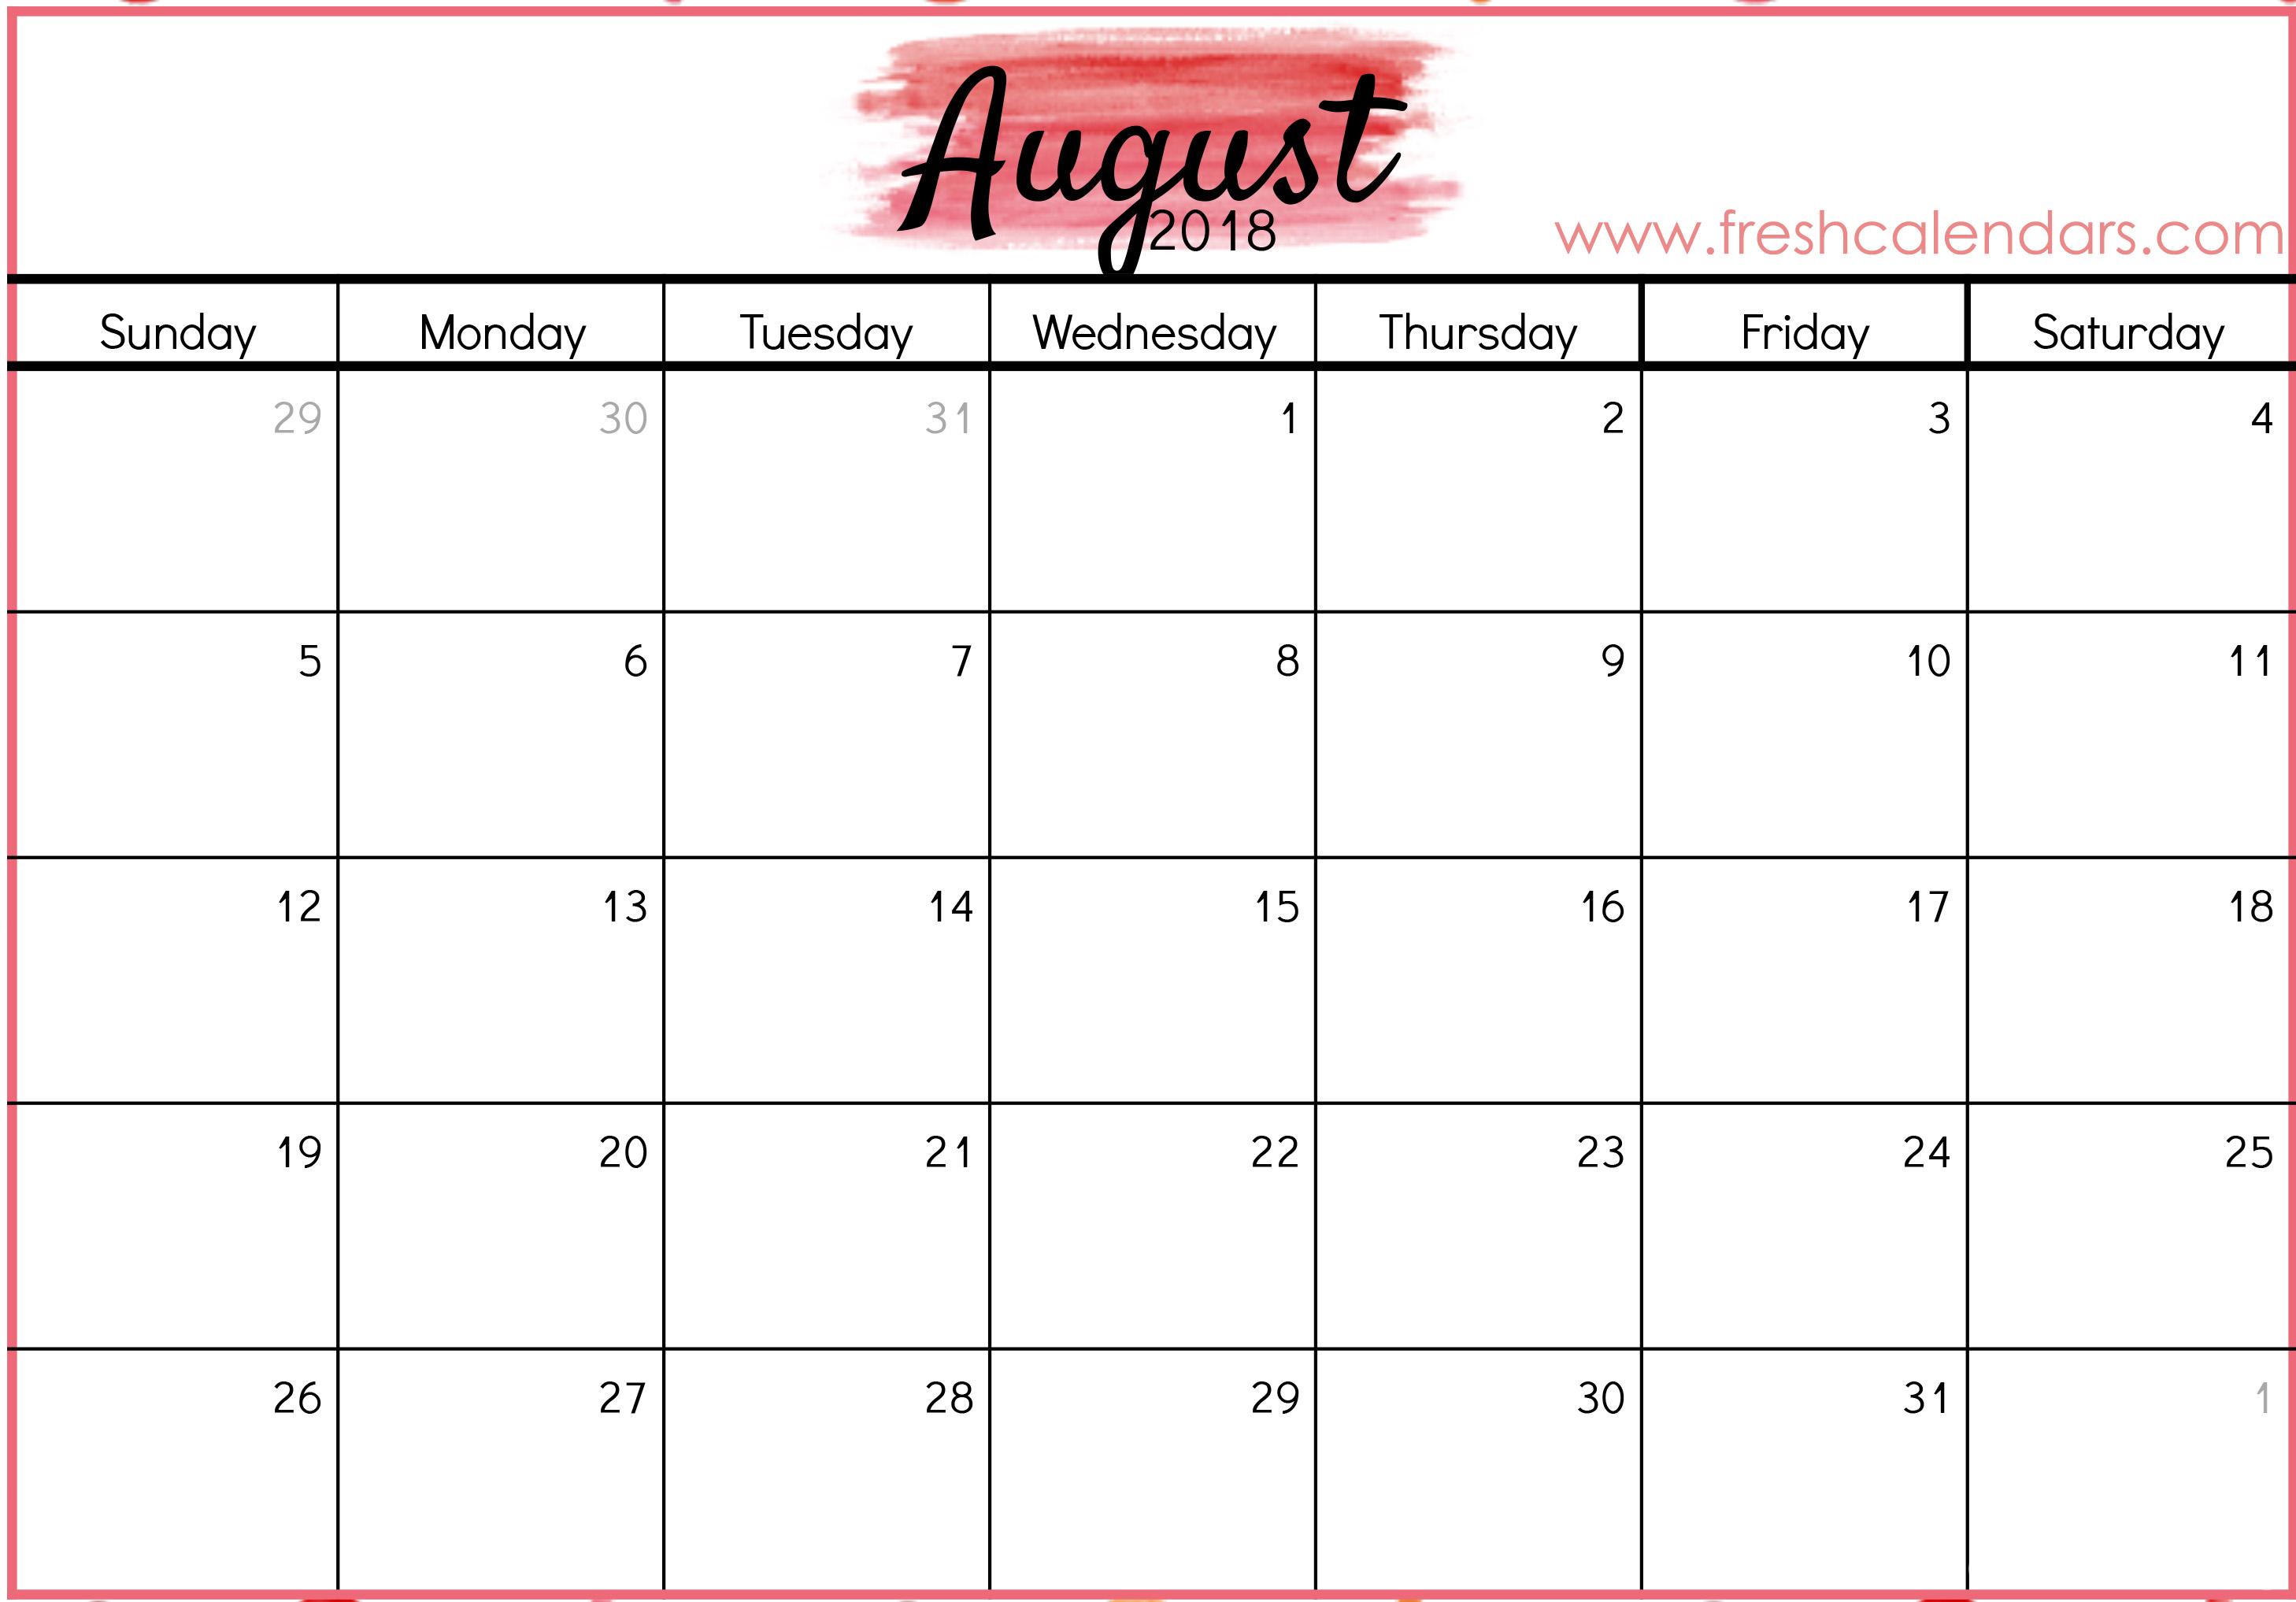 August 2018 Calendar Printable - Fresh Calendars with regard to Cute August Monthly Calendar Template Printable